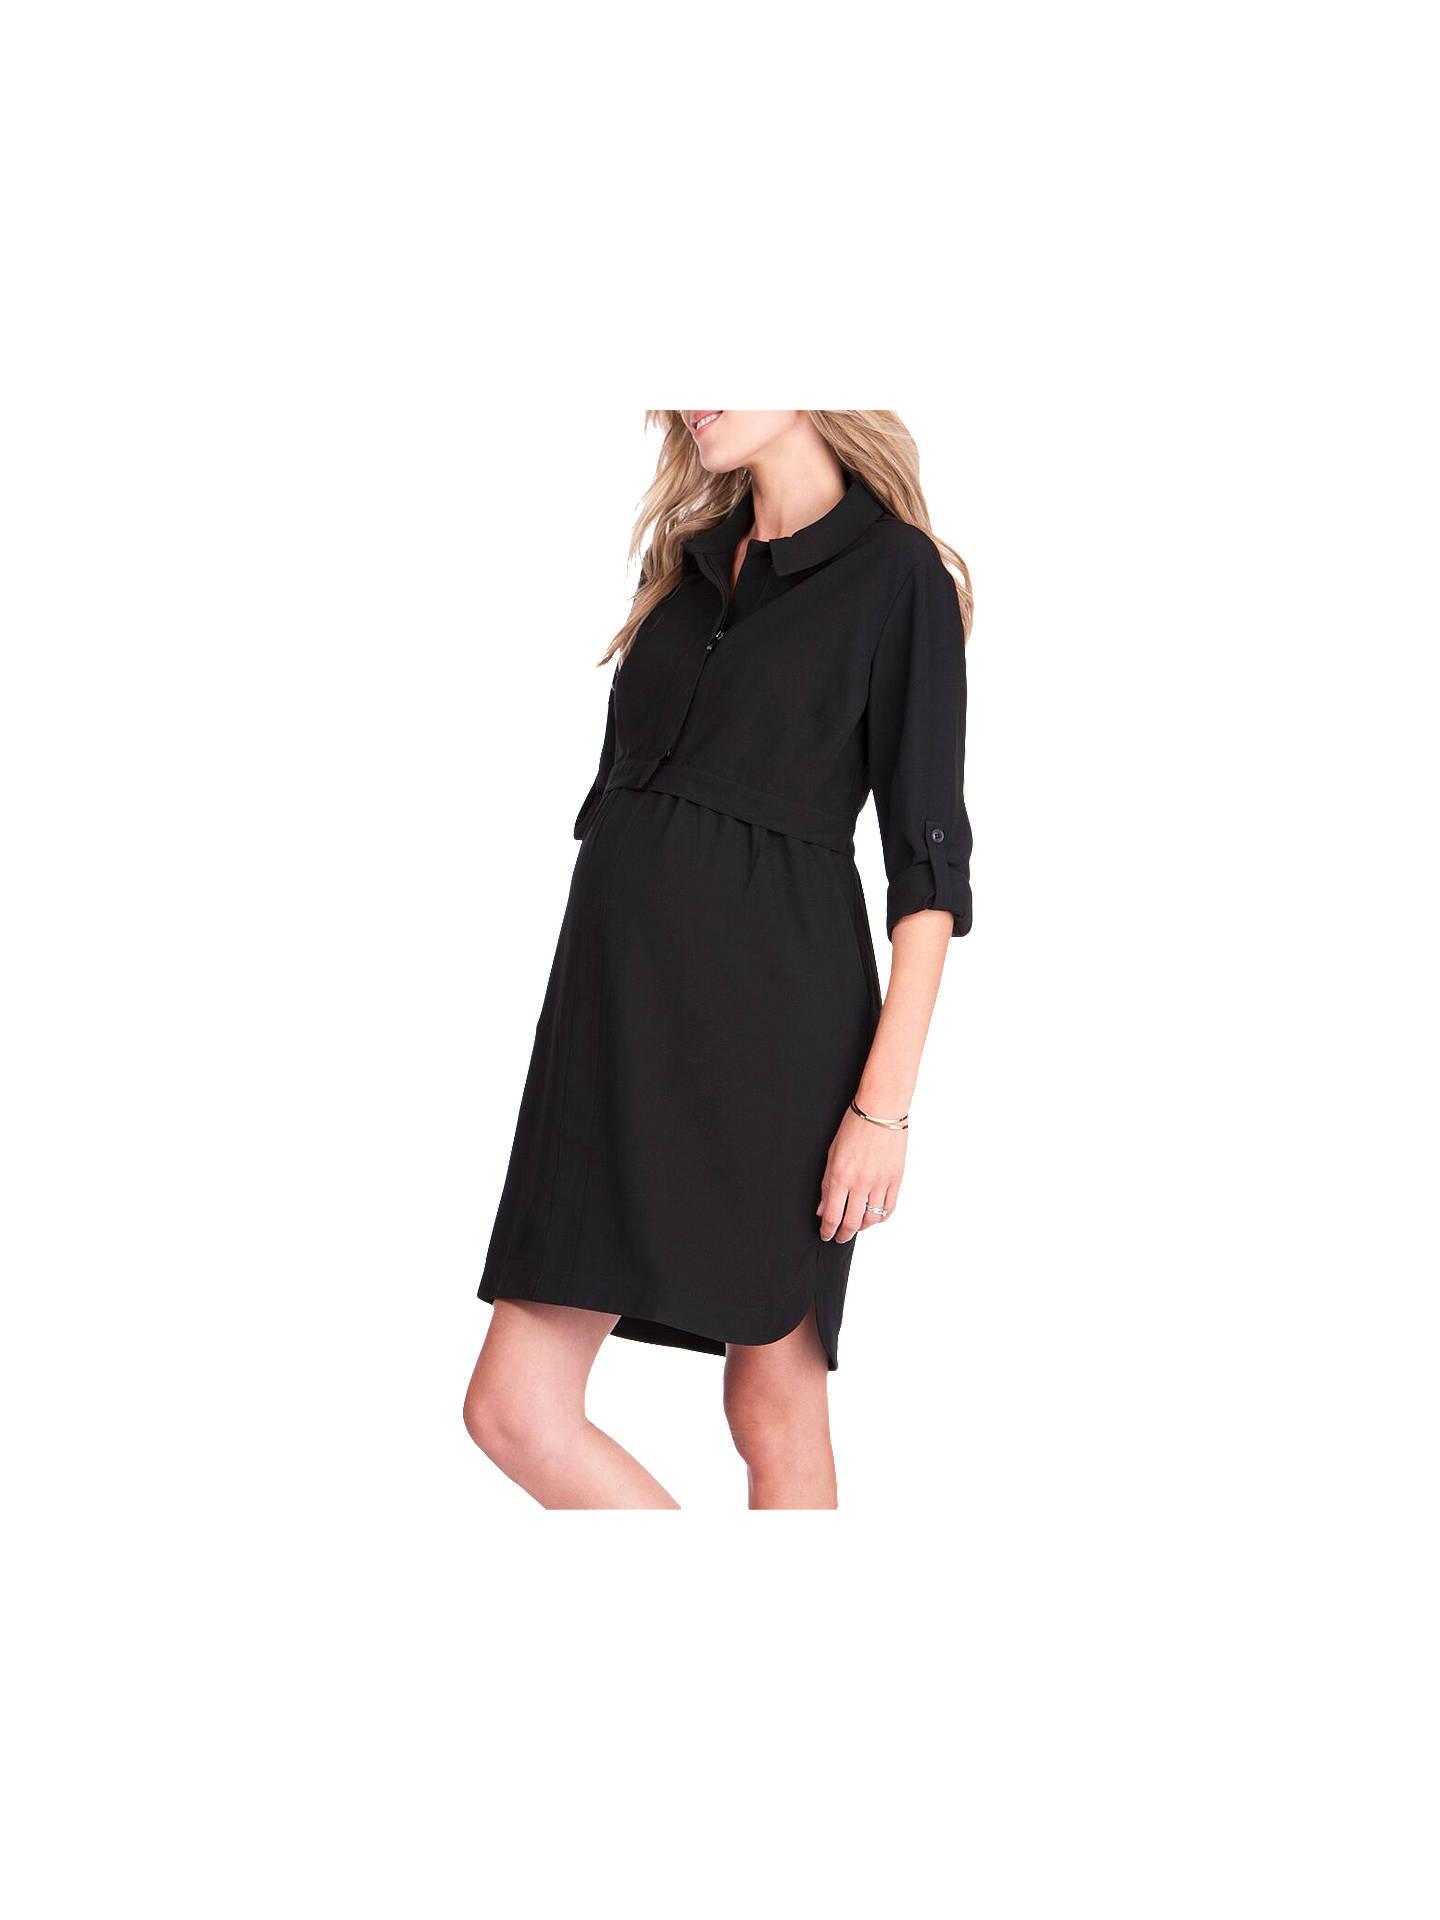 Sraphine Grace Maternity Nursing Dress Black At John Lewis Partners